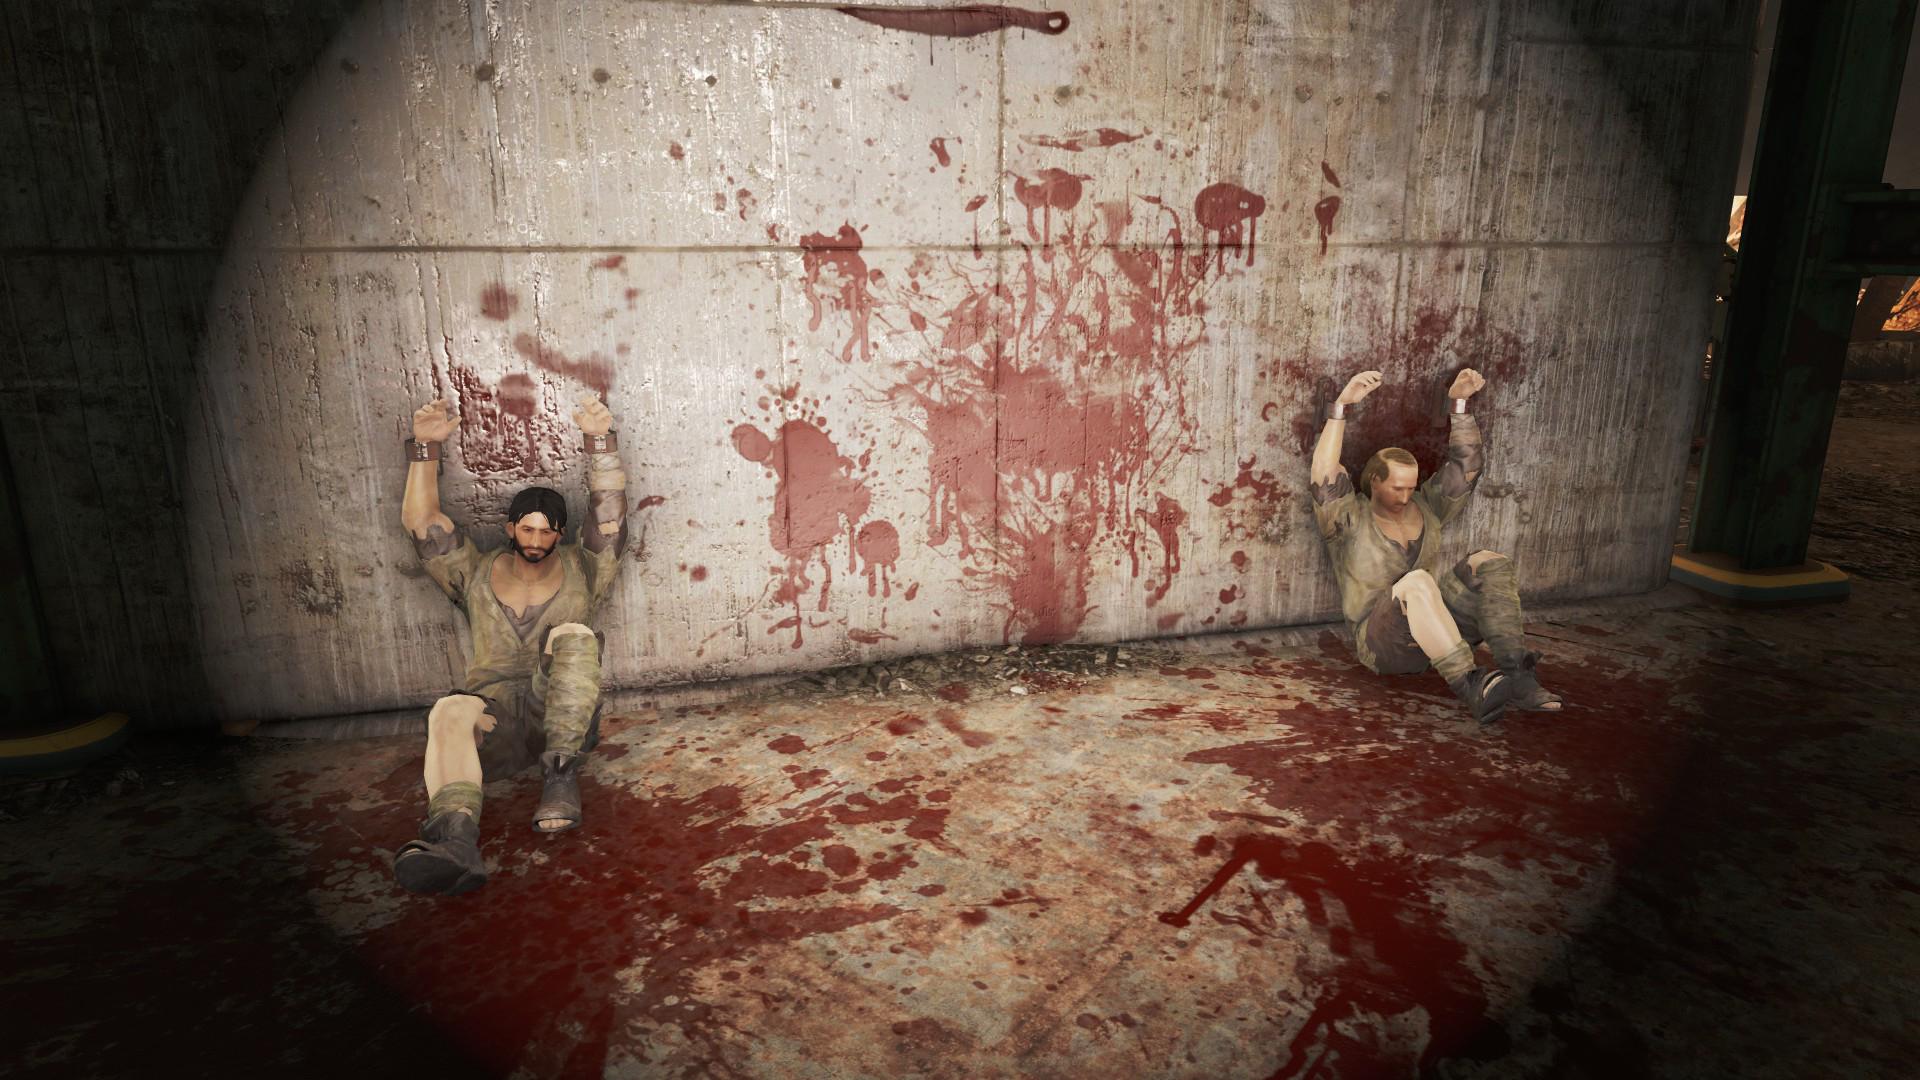 image prisoner nukaworld jpg fallout wiki fandom powered by wikia